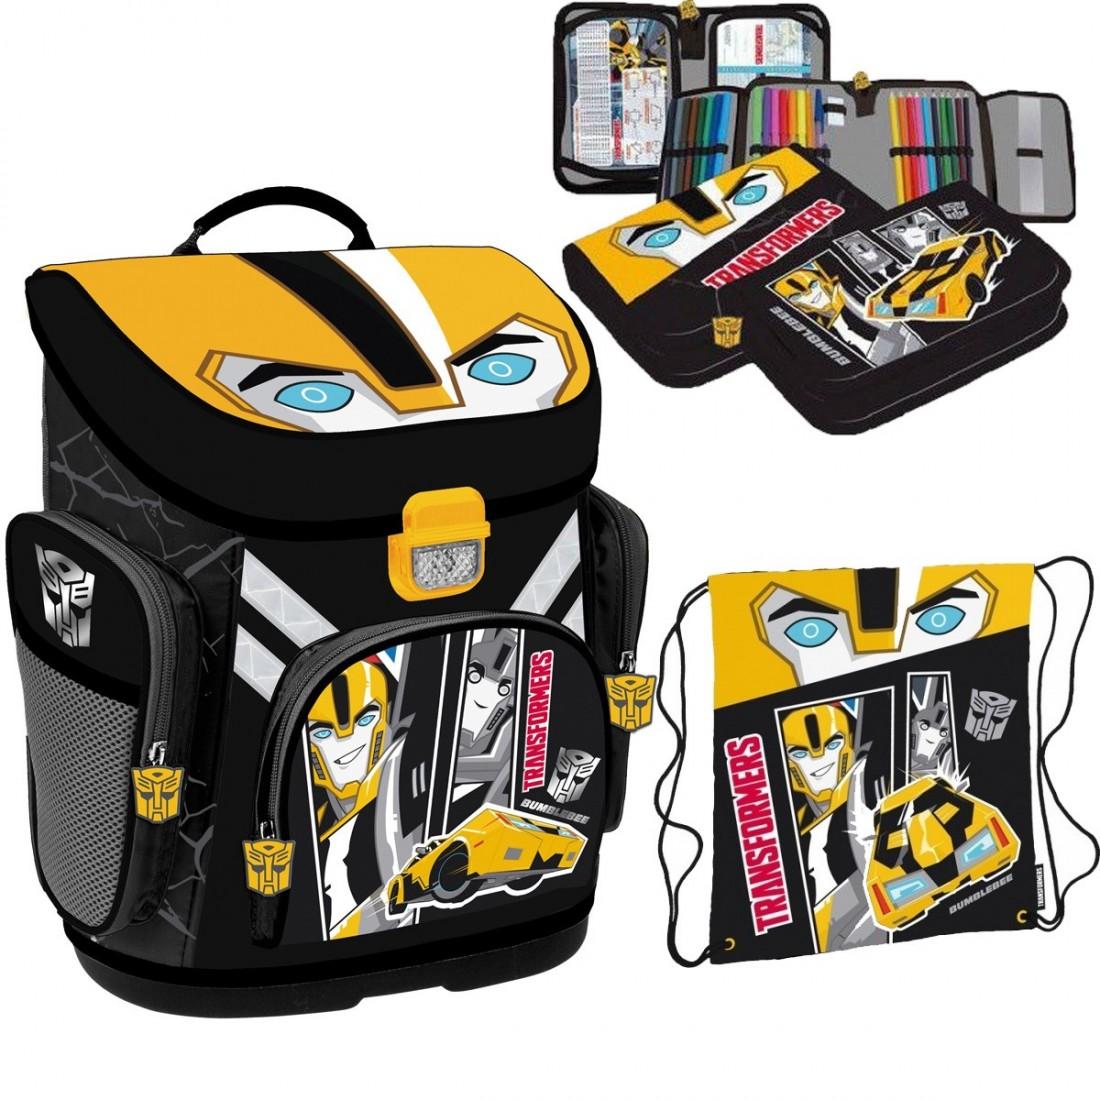 70295384c5cc0 ZESTAW Tornister Szkolny Transformers Bumblebee Supermocni - plecak ...